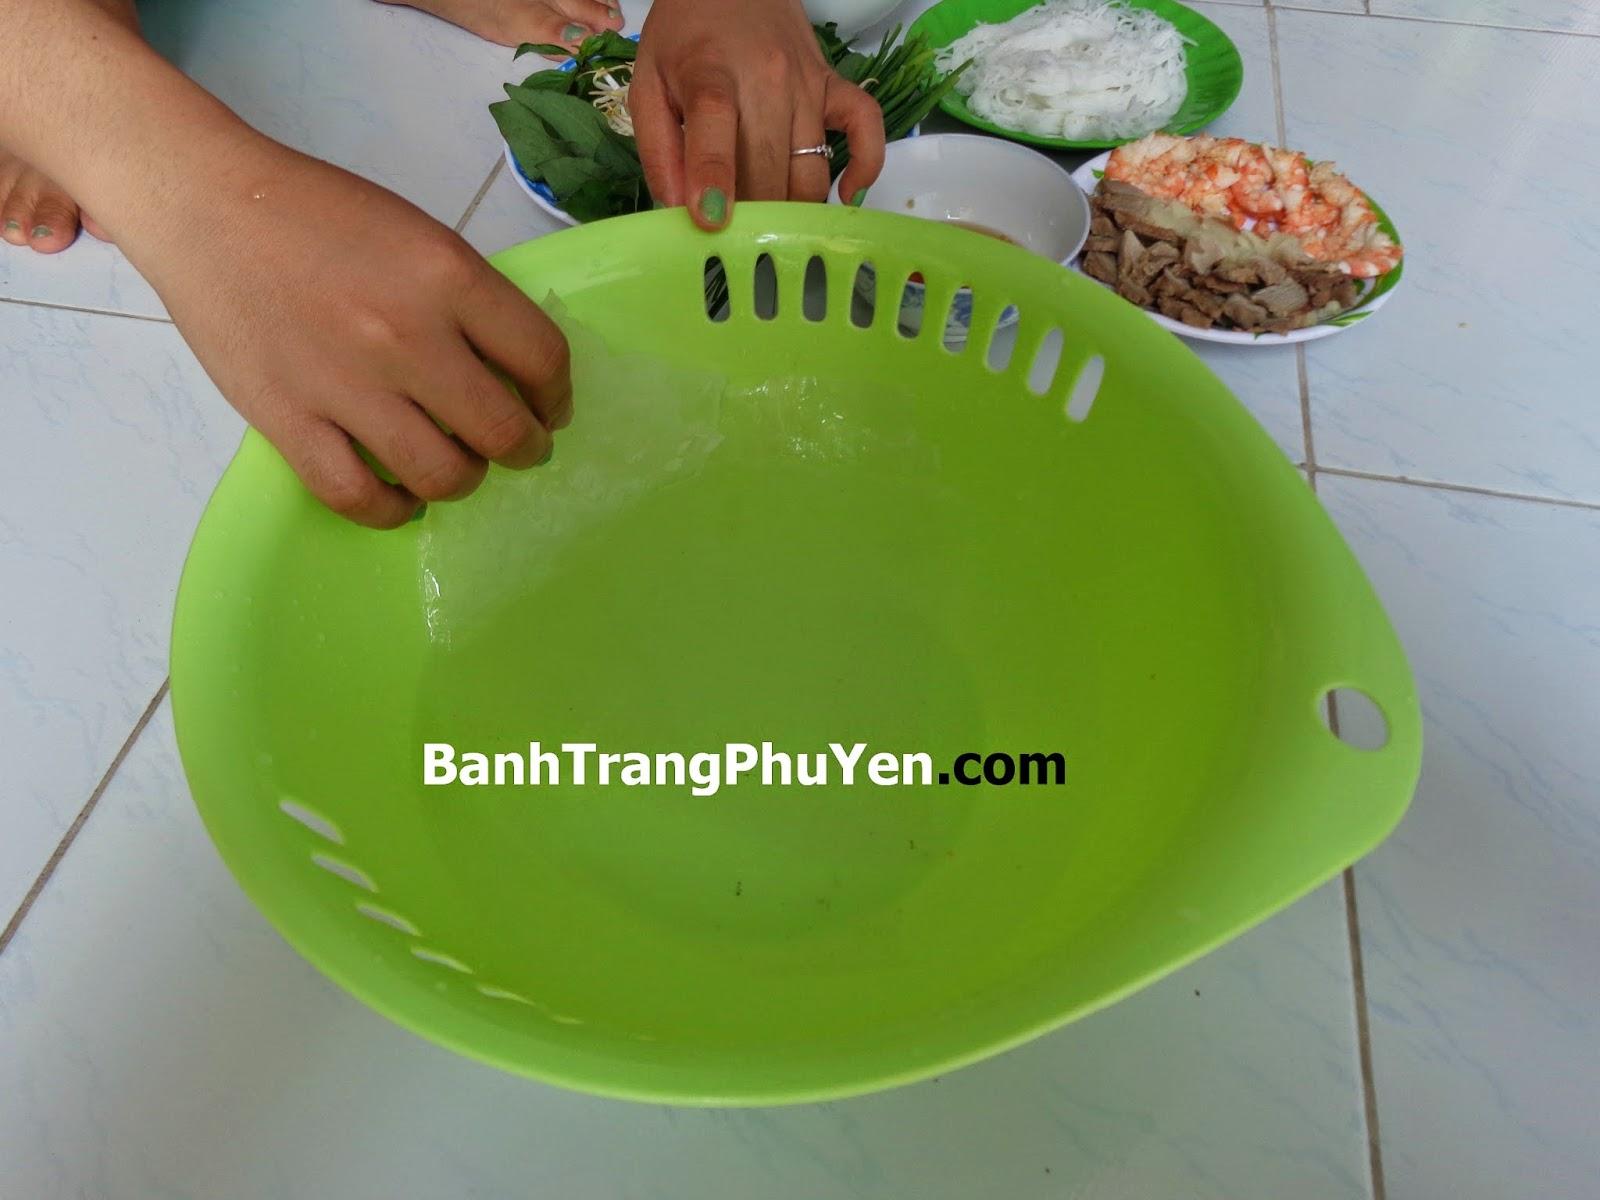 Dac-San-Phu-Yen-Banh-Trang-Hoa-Da-banh-cuon-tom-thit